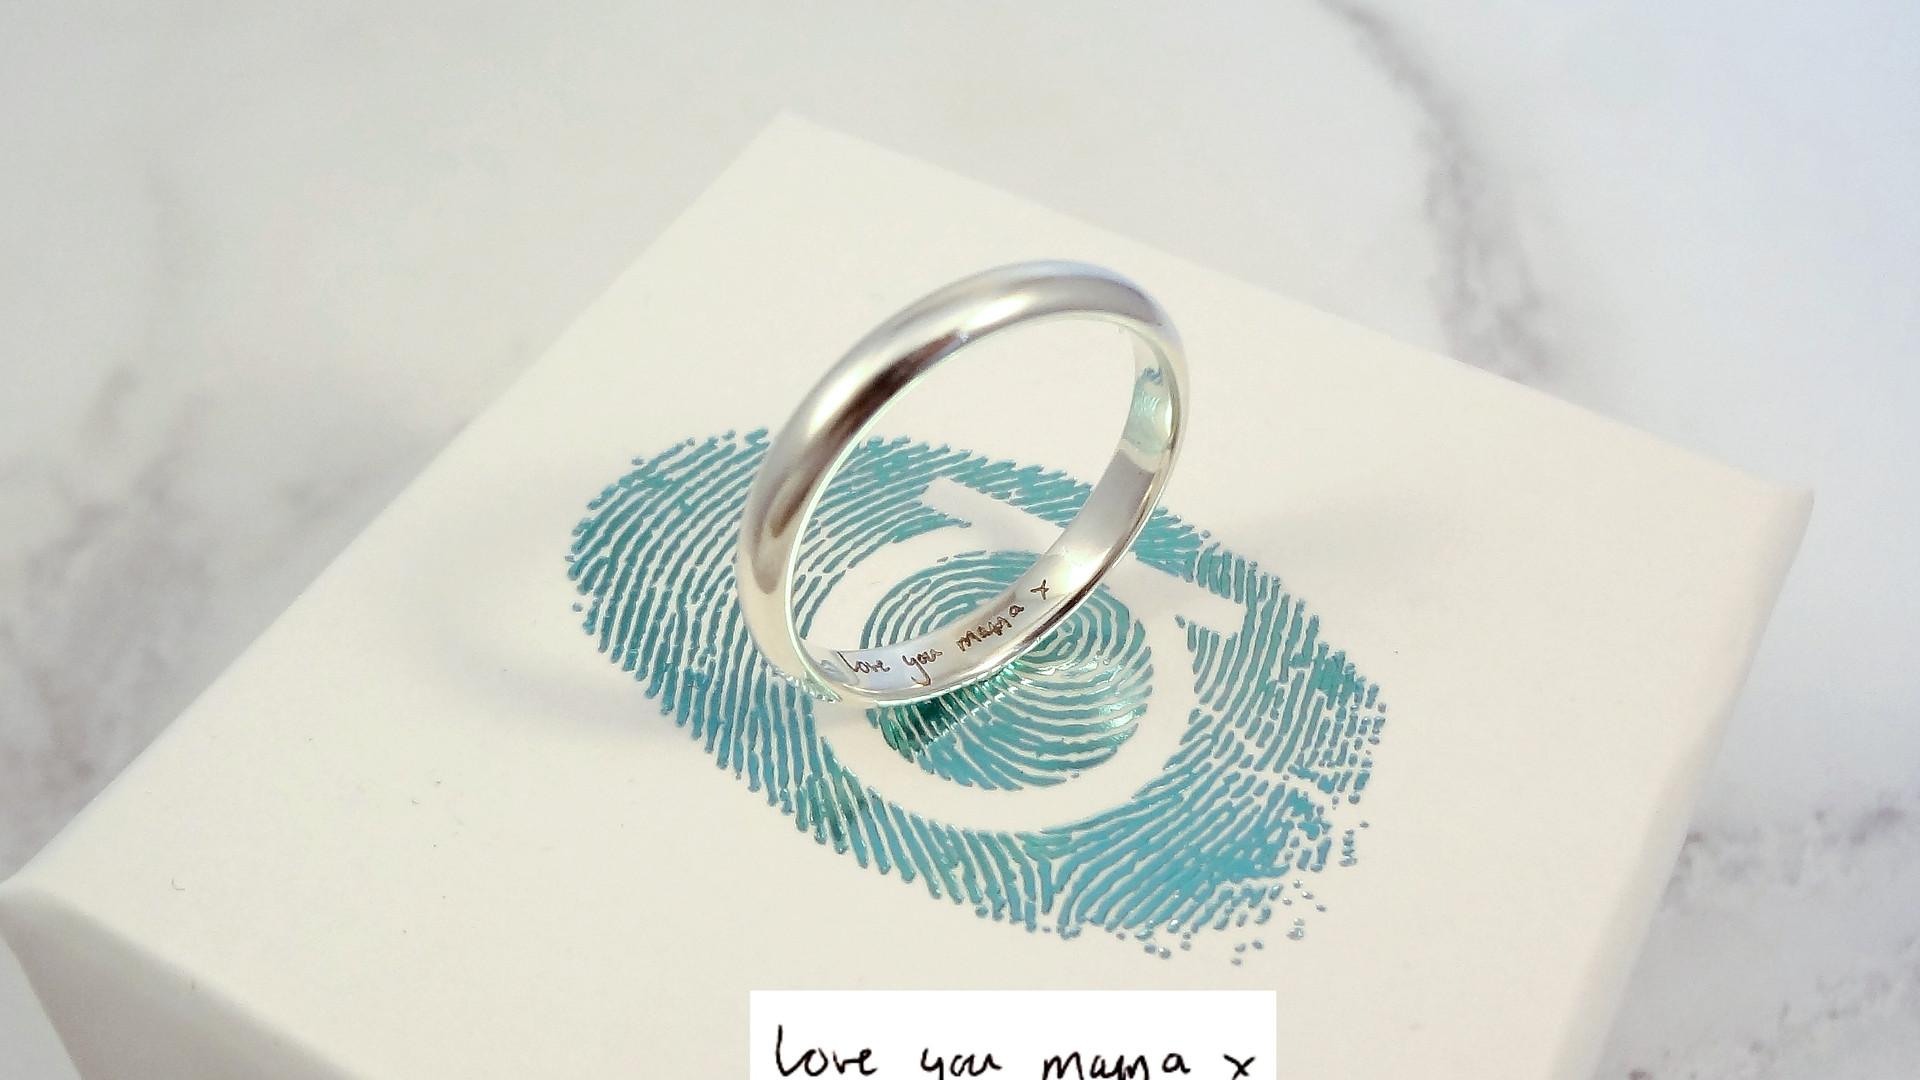 Handwriting ring